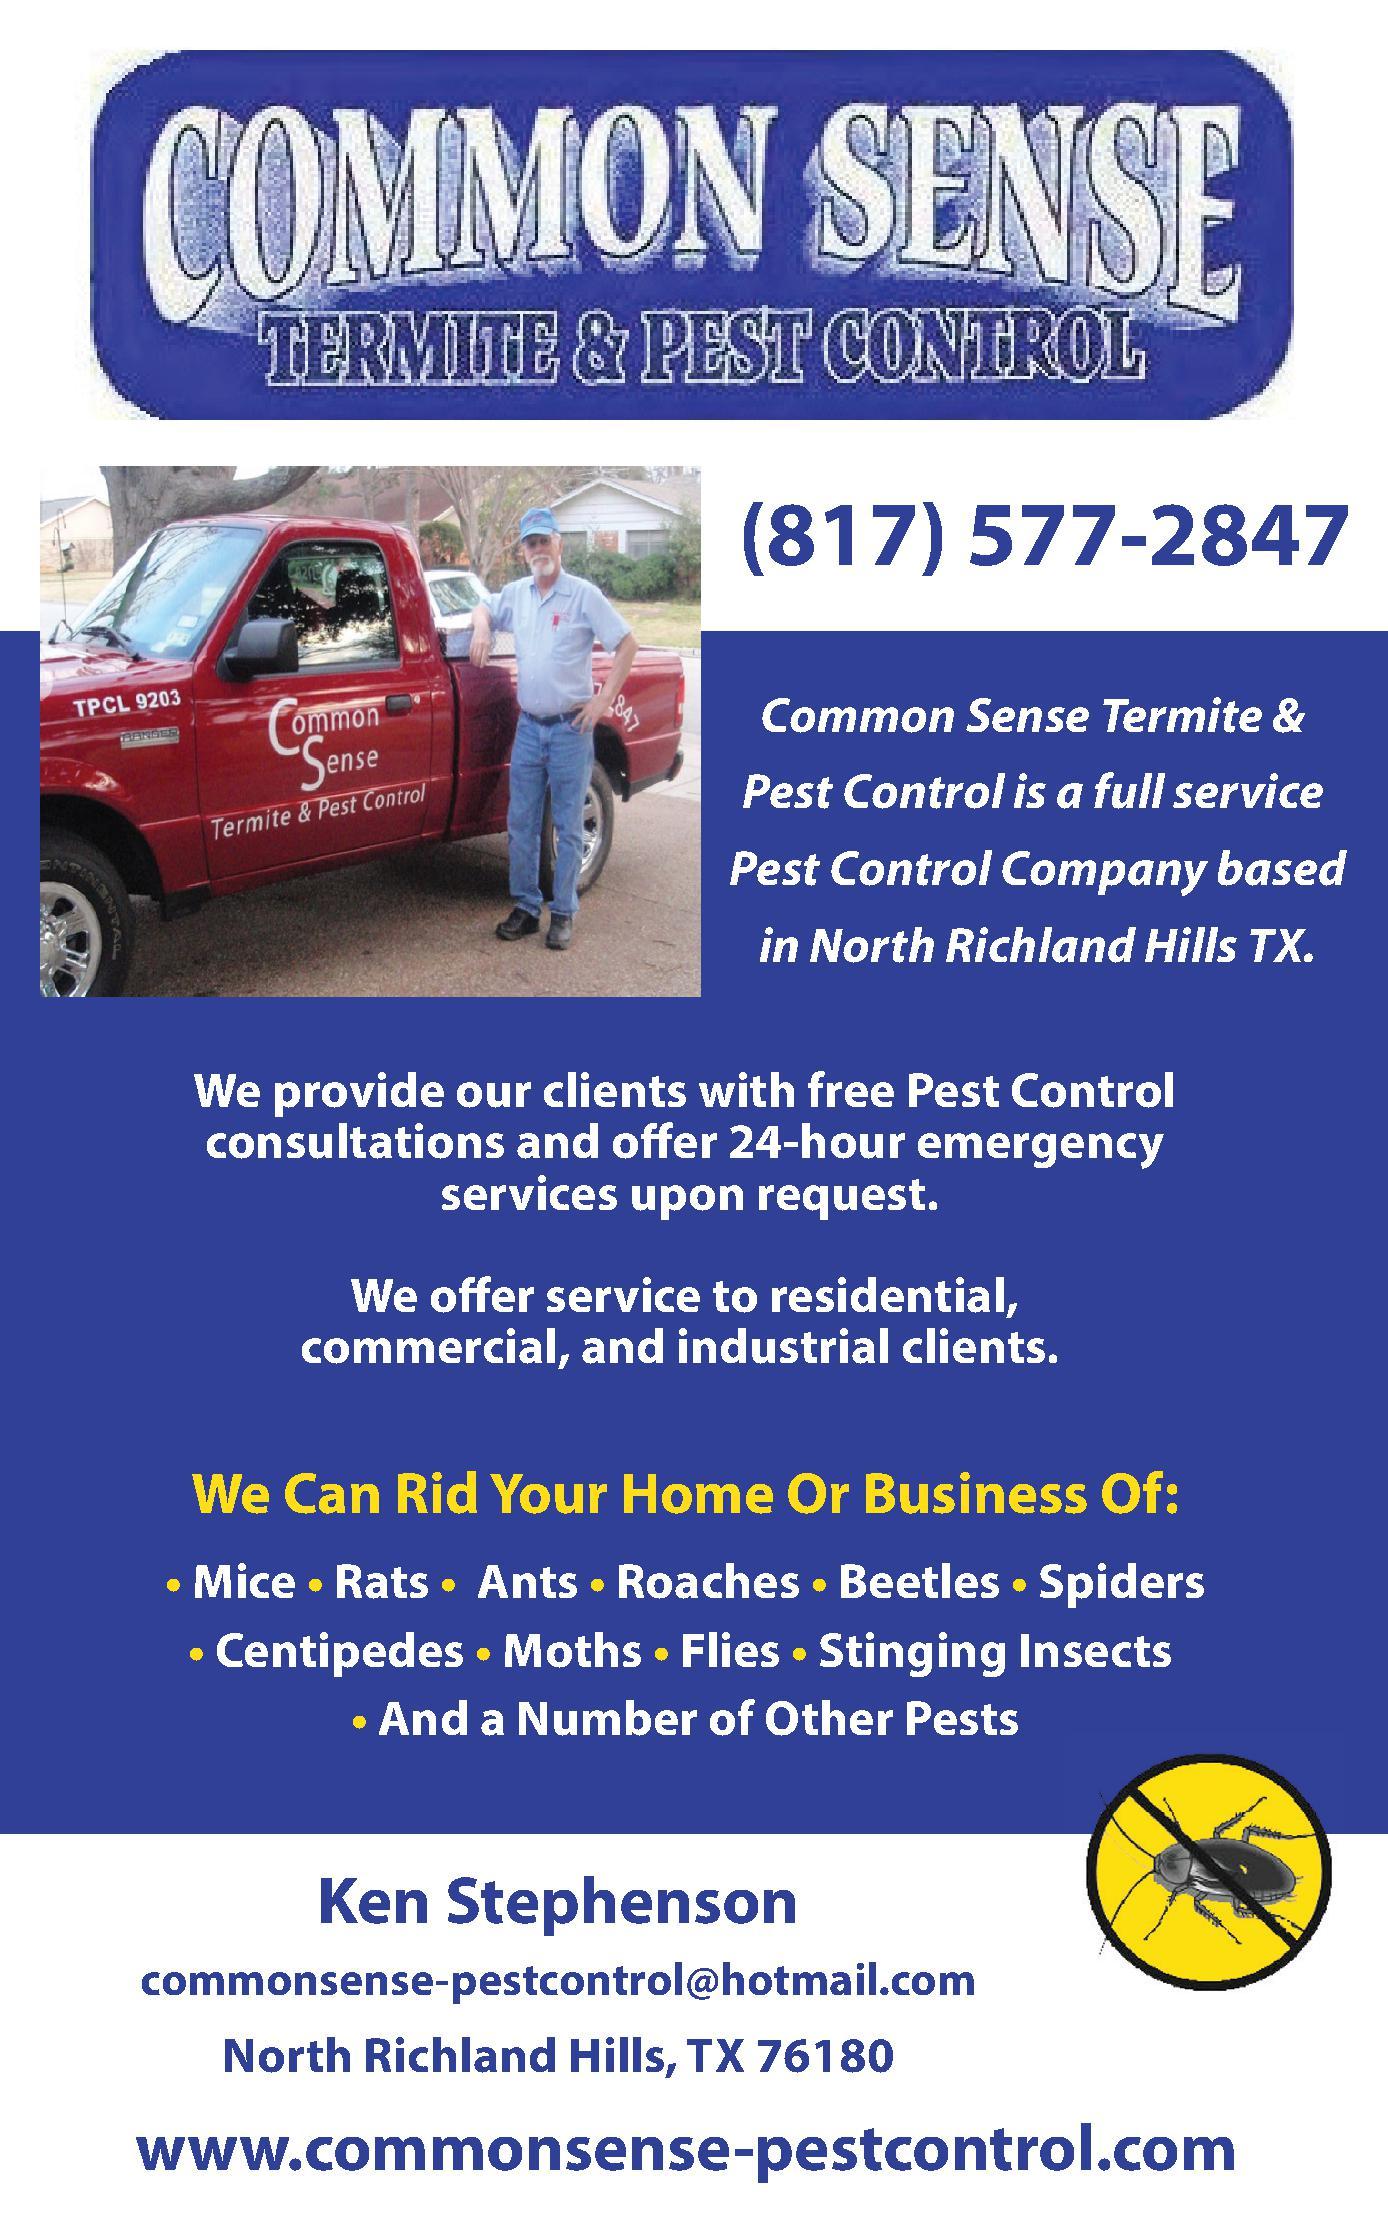 Common Sense Termite and Pest Control